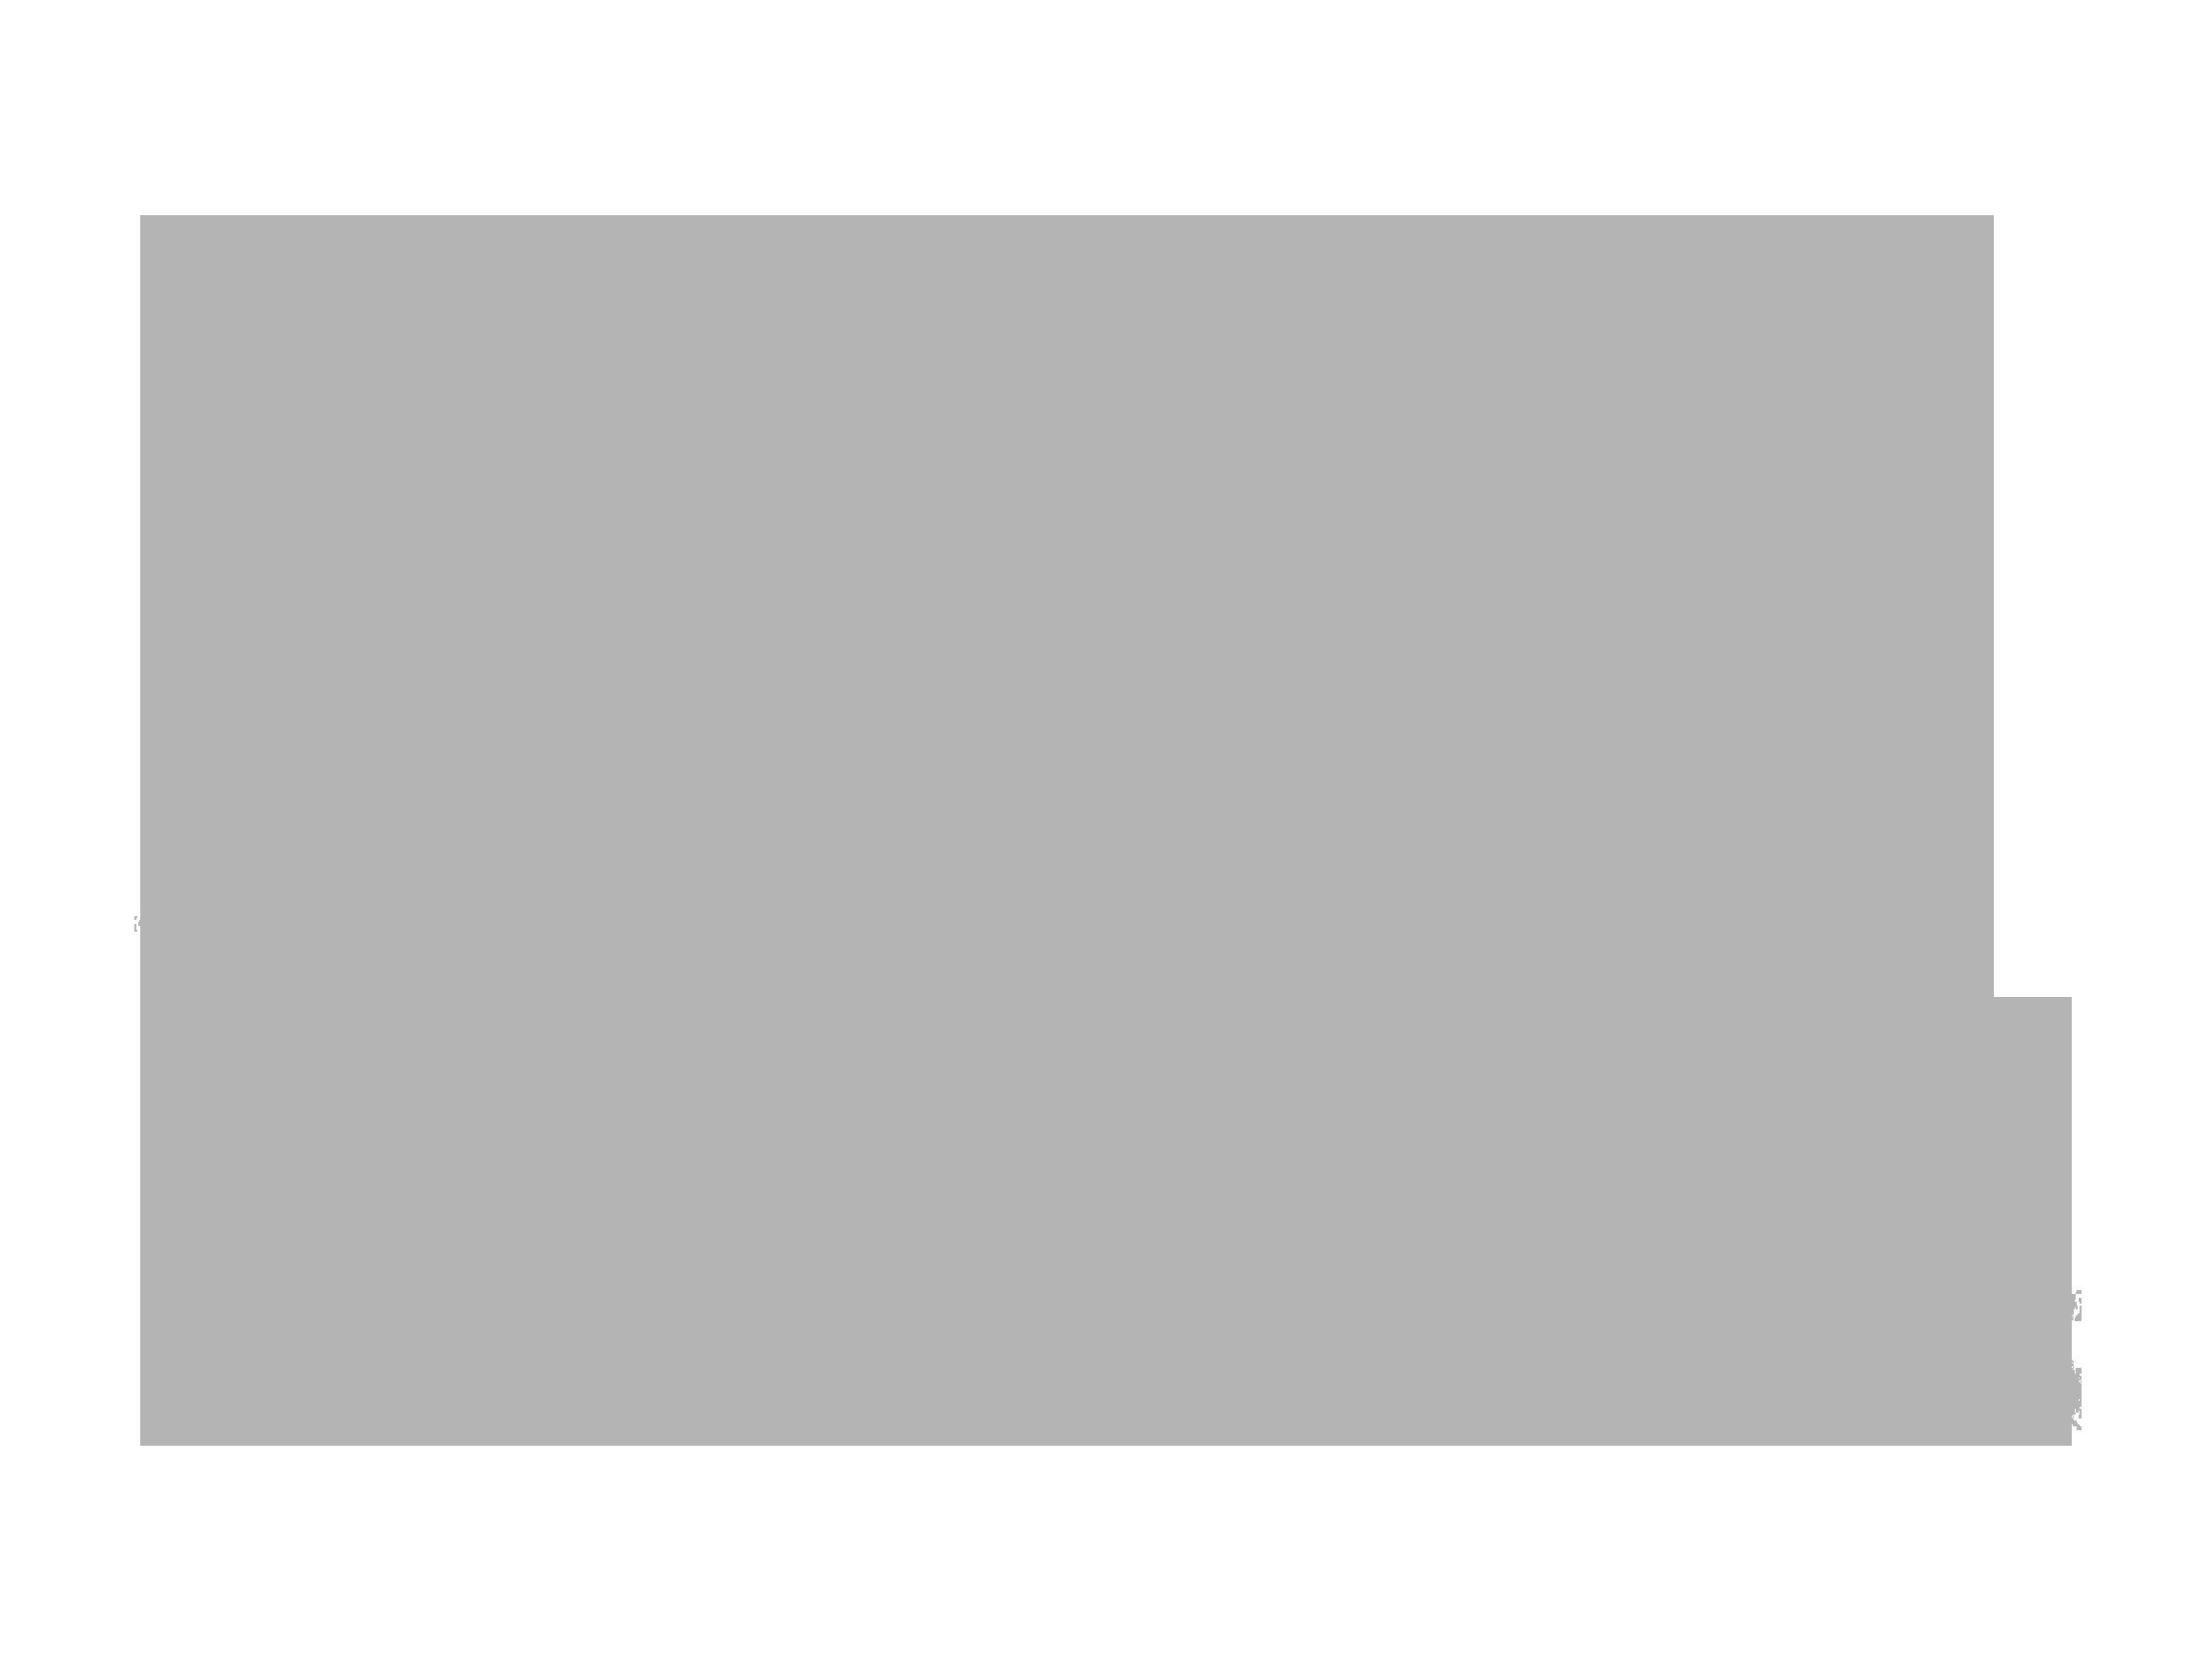 wella-logo-logotype_gray